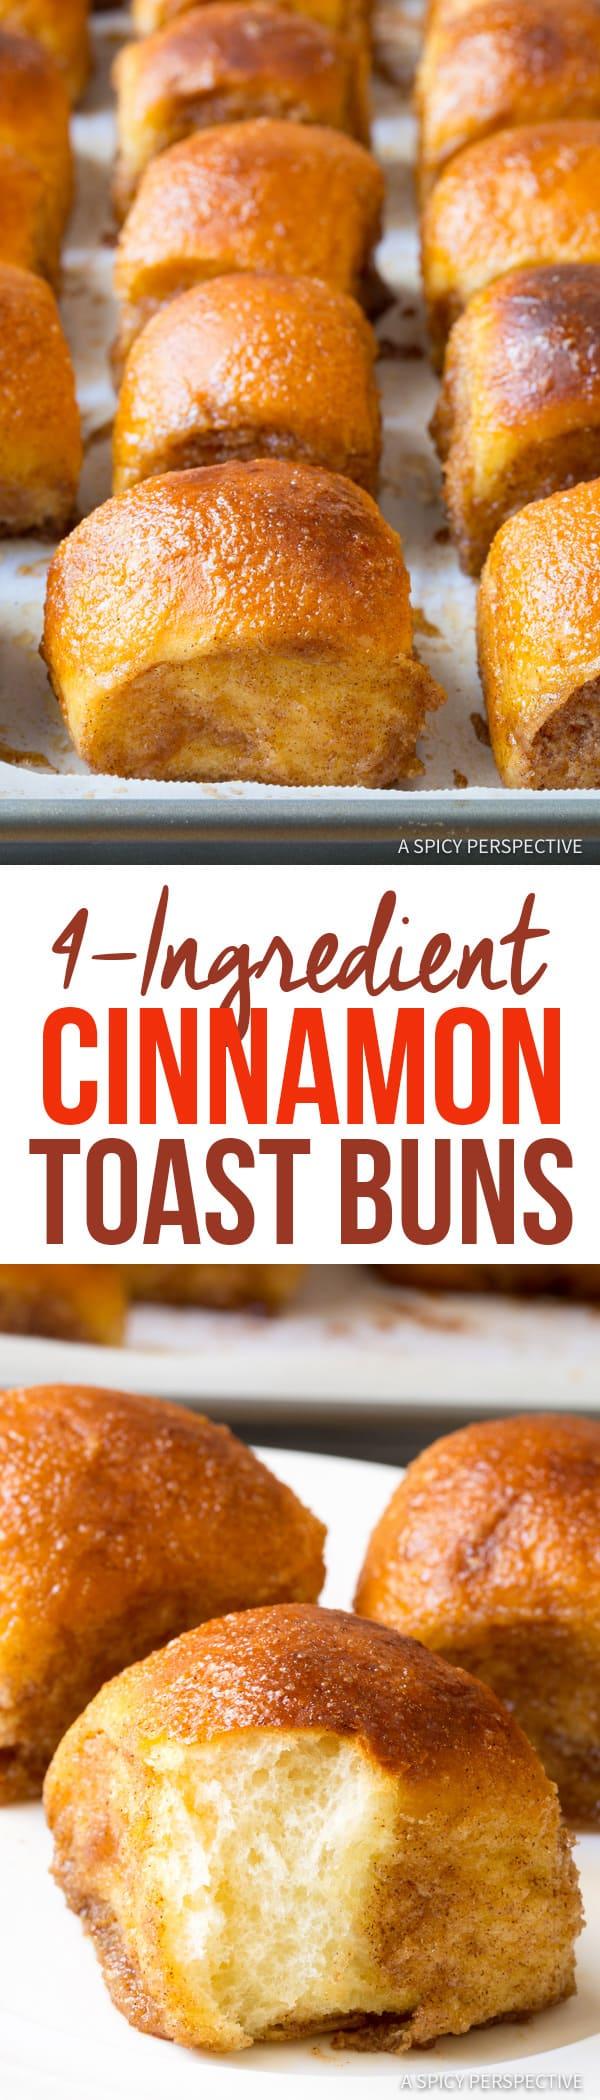 Swoon-Worthy 4-Ingredient Cinnamon Toast Buns | ASpicyPerspective.com